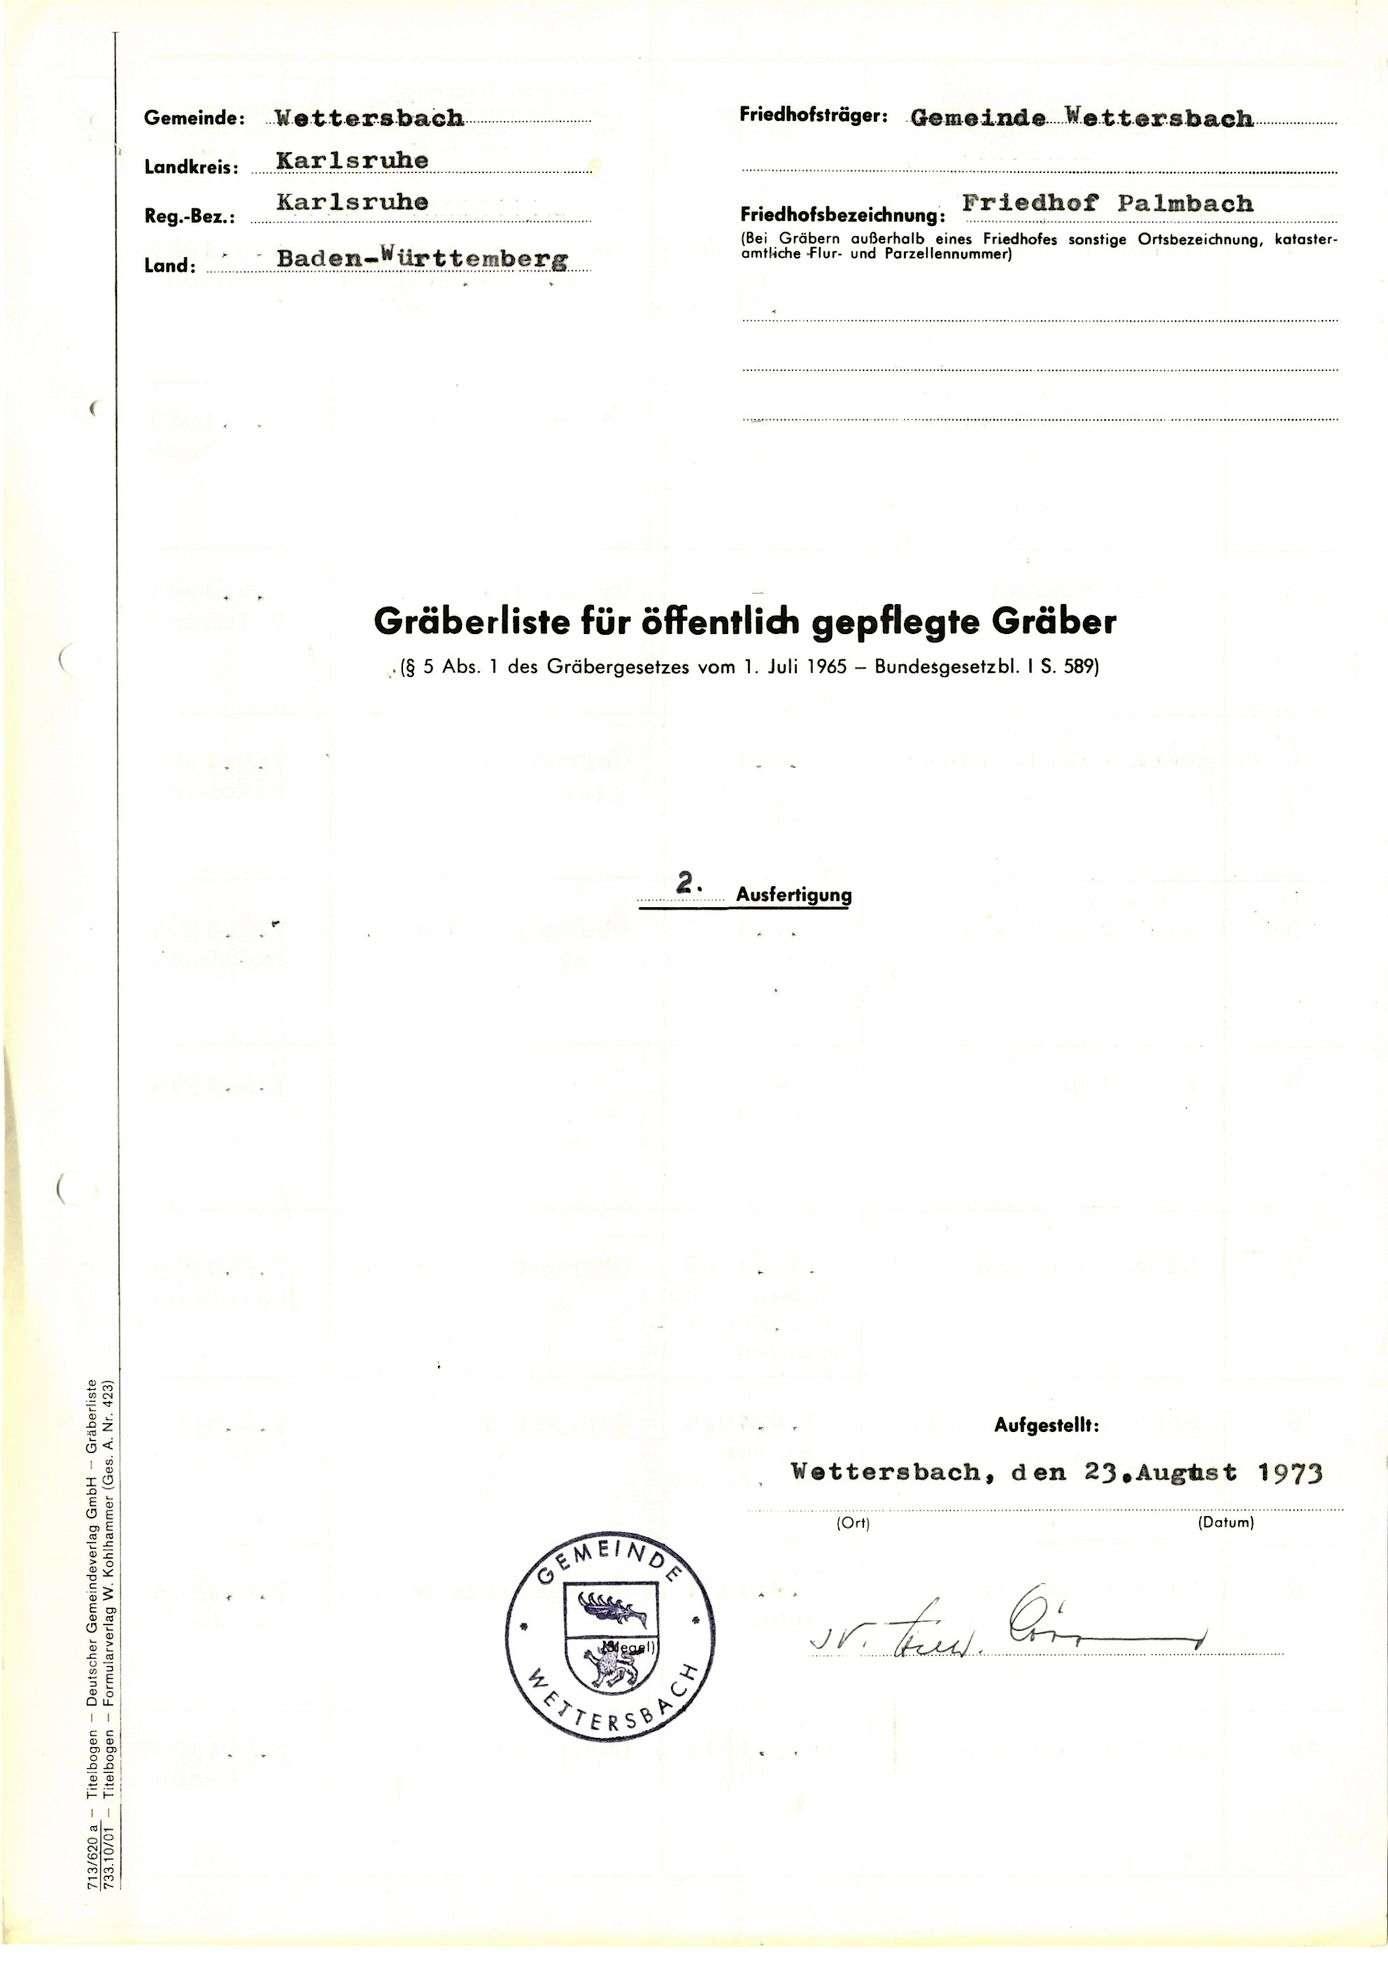 Palmbach, Bild 1